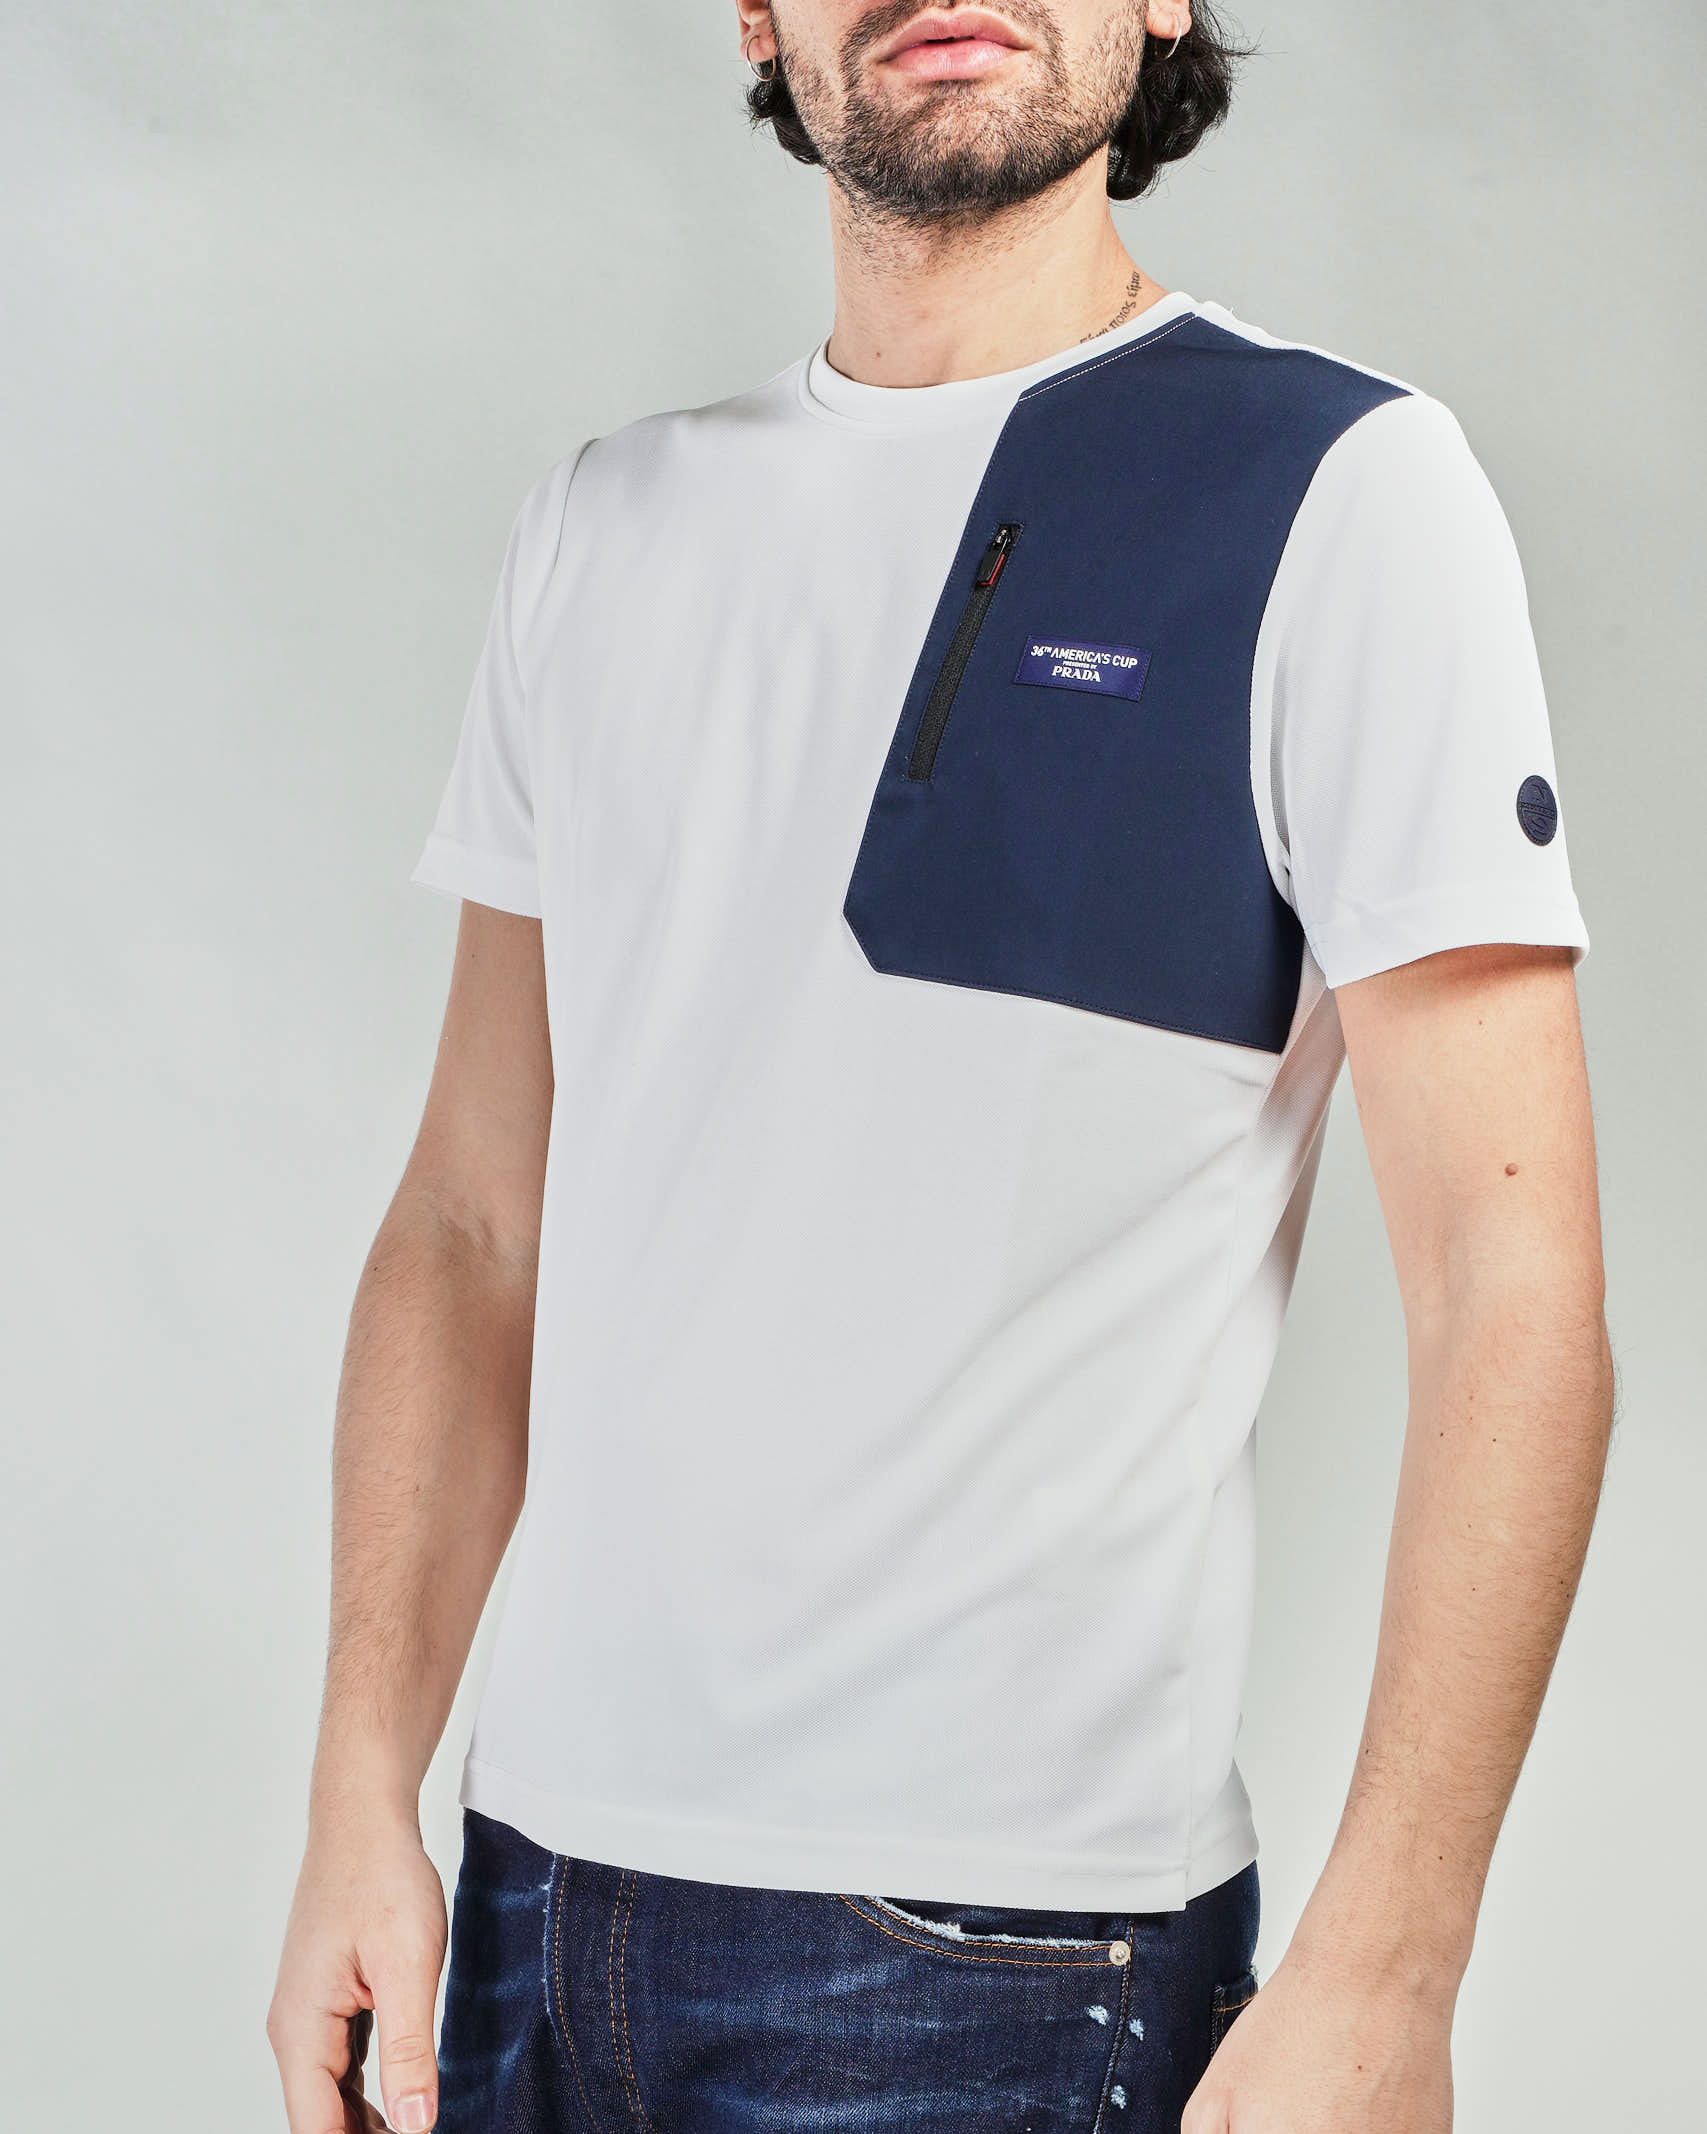 T-shirt con logo a contrasto North Sails X Prada NORTH SAILS X PRADA | T-shirt | 452309101